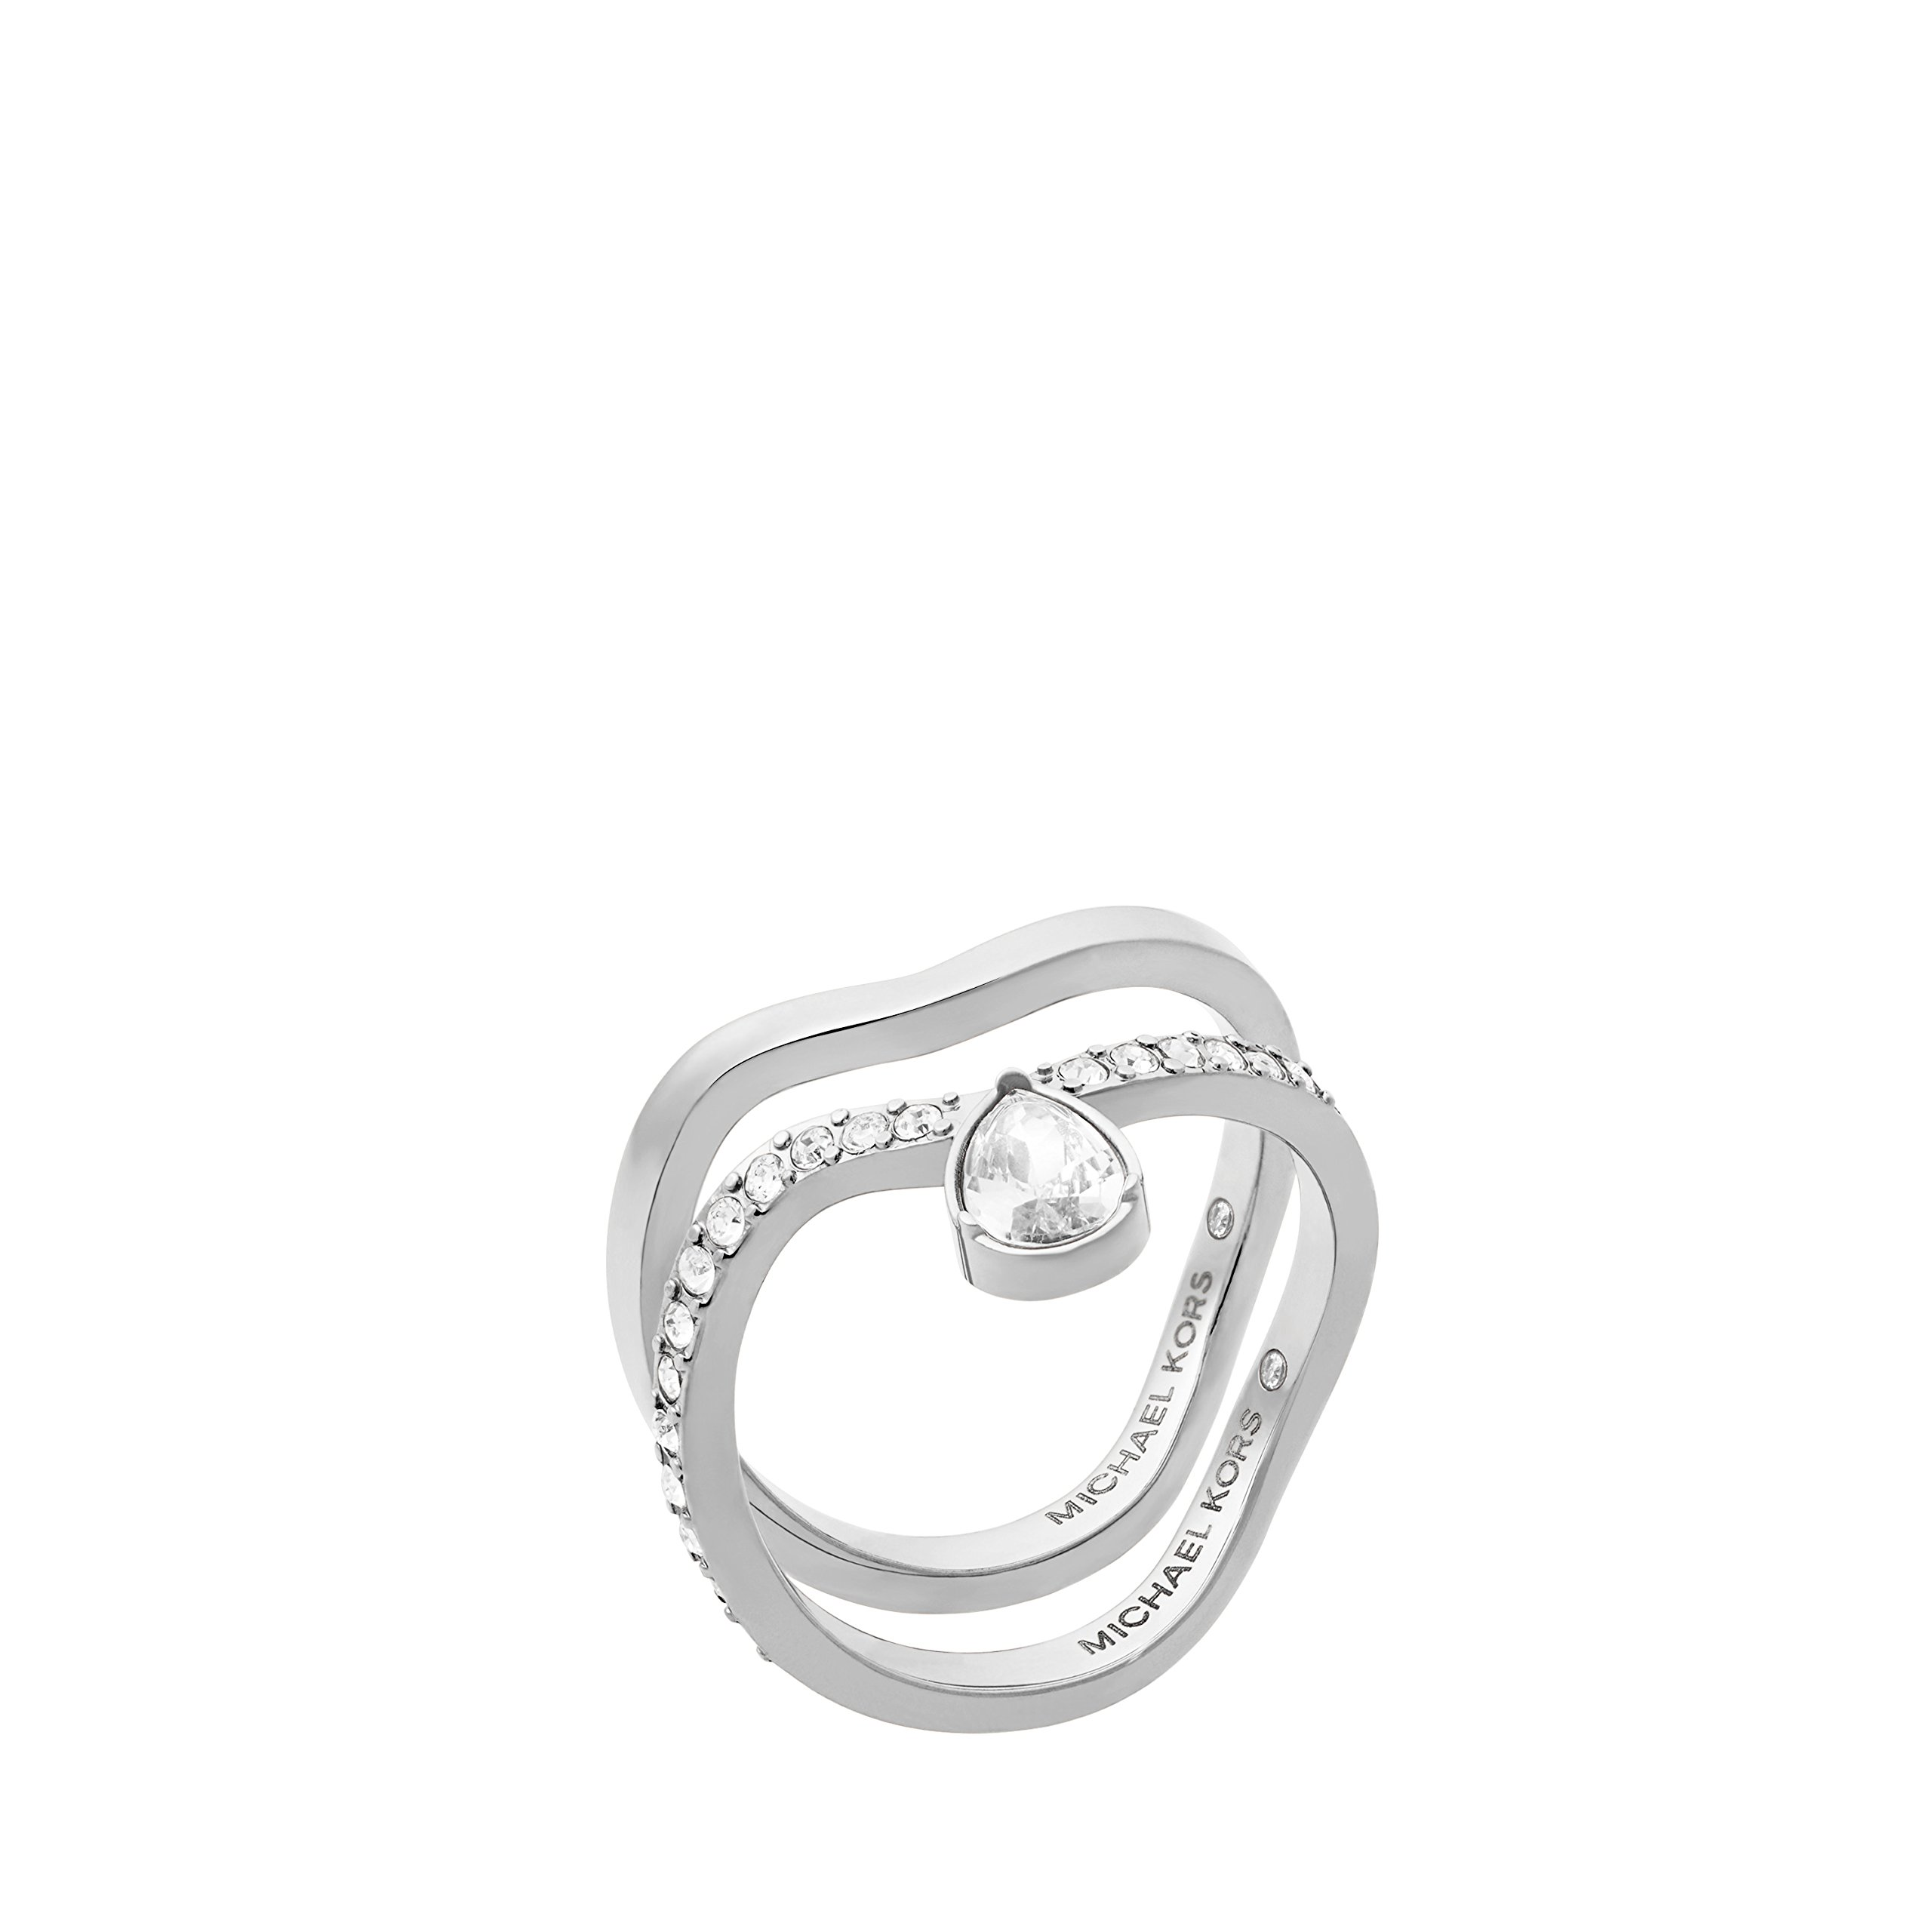 Michael Kors Womens Silver-Tone Ring Set, 7